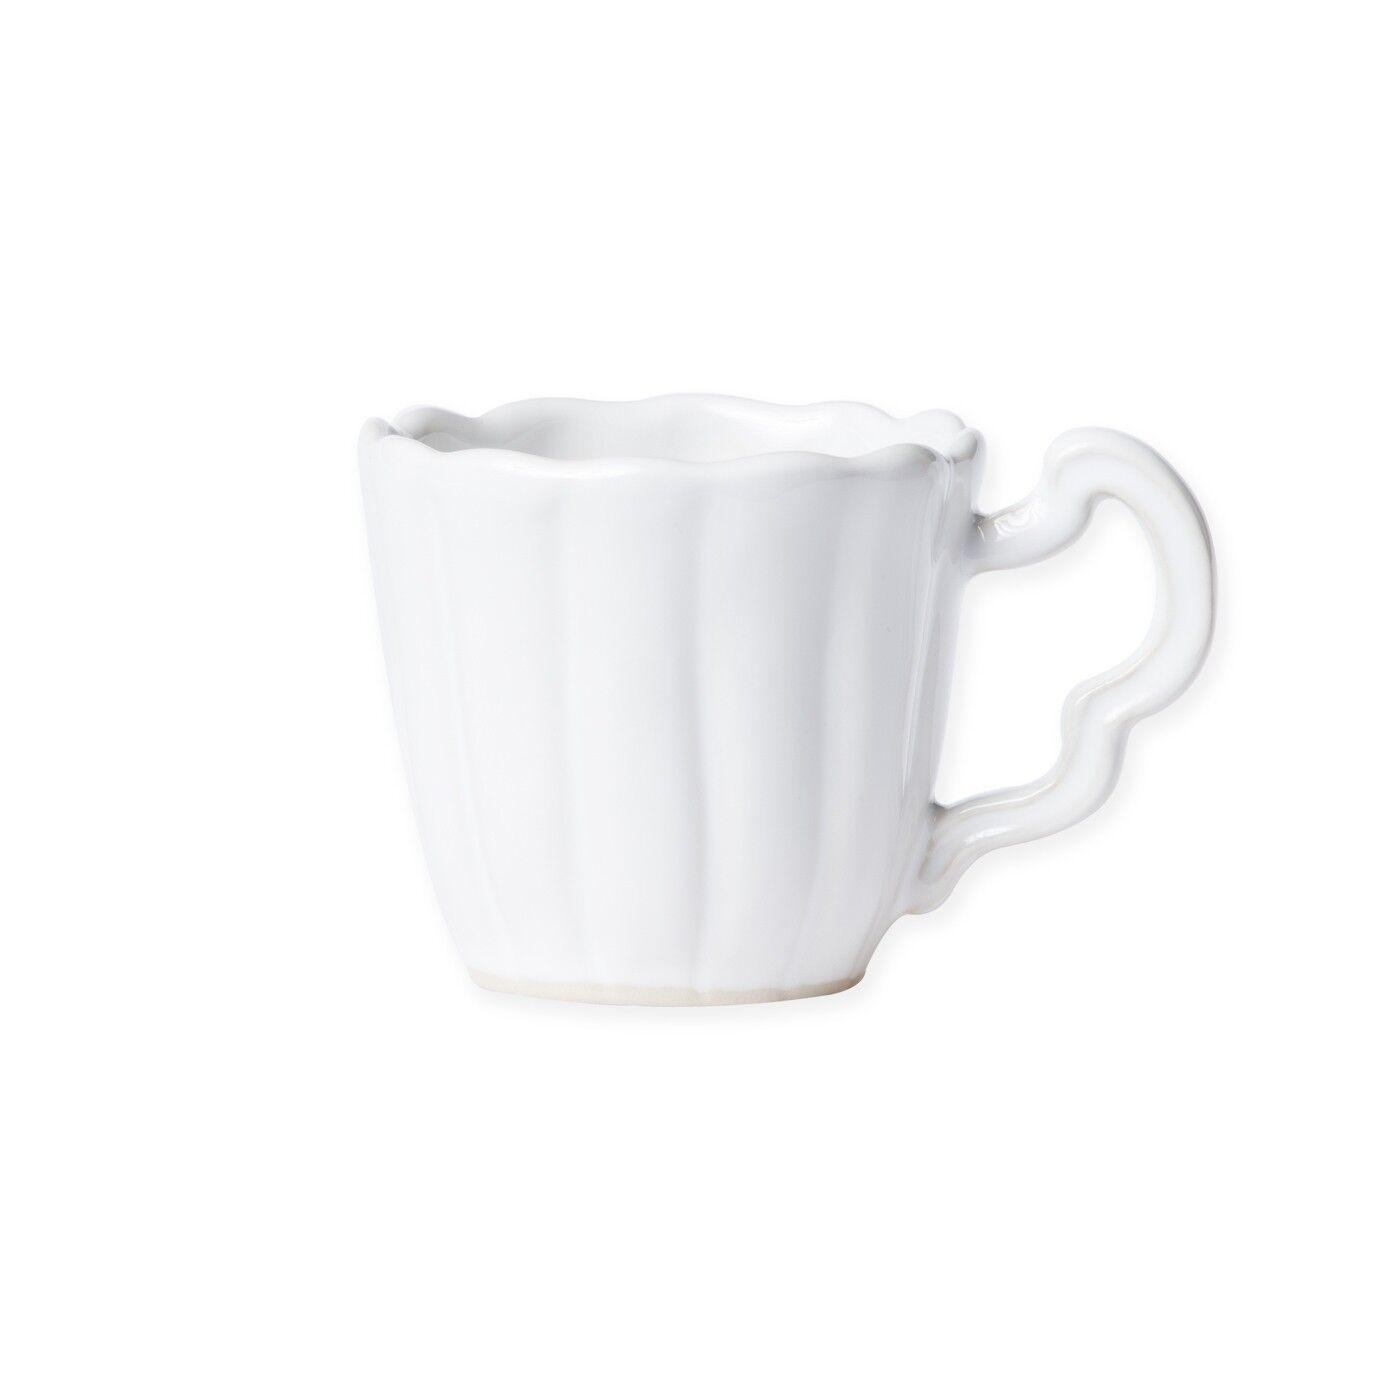 Vietri Incanto Stone Weiß Scallop Mug Mug Mug - Set of 4 c57278